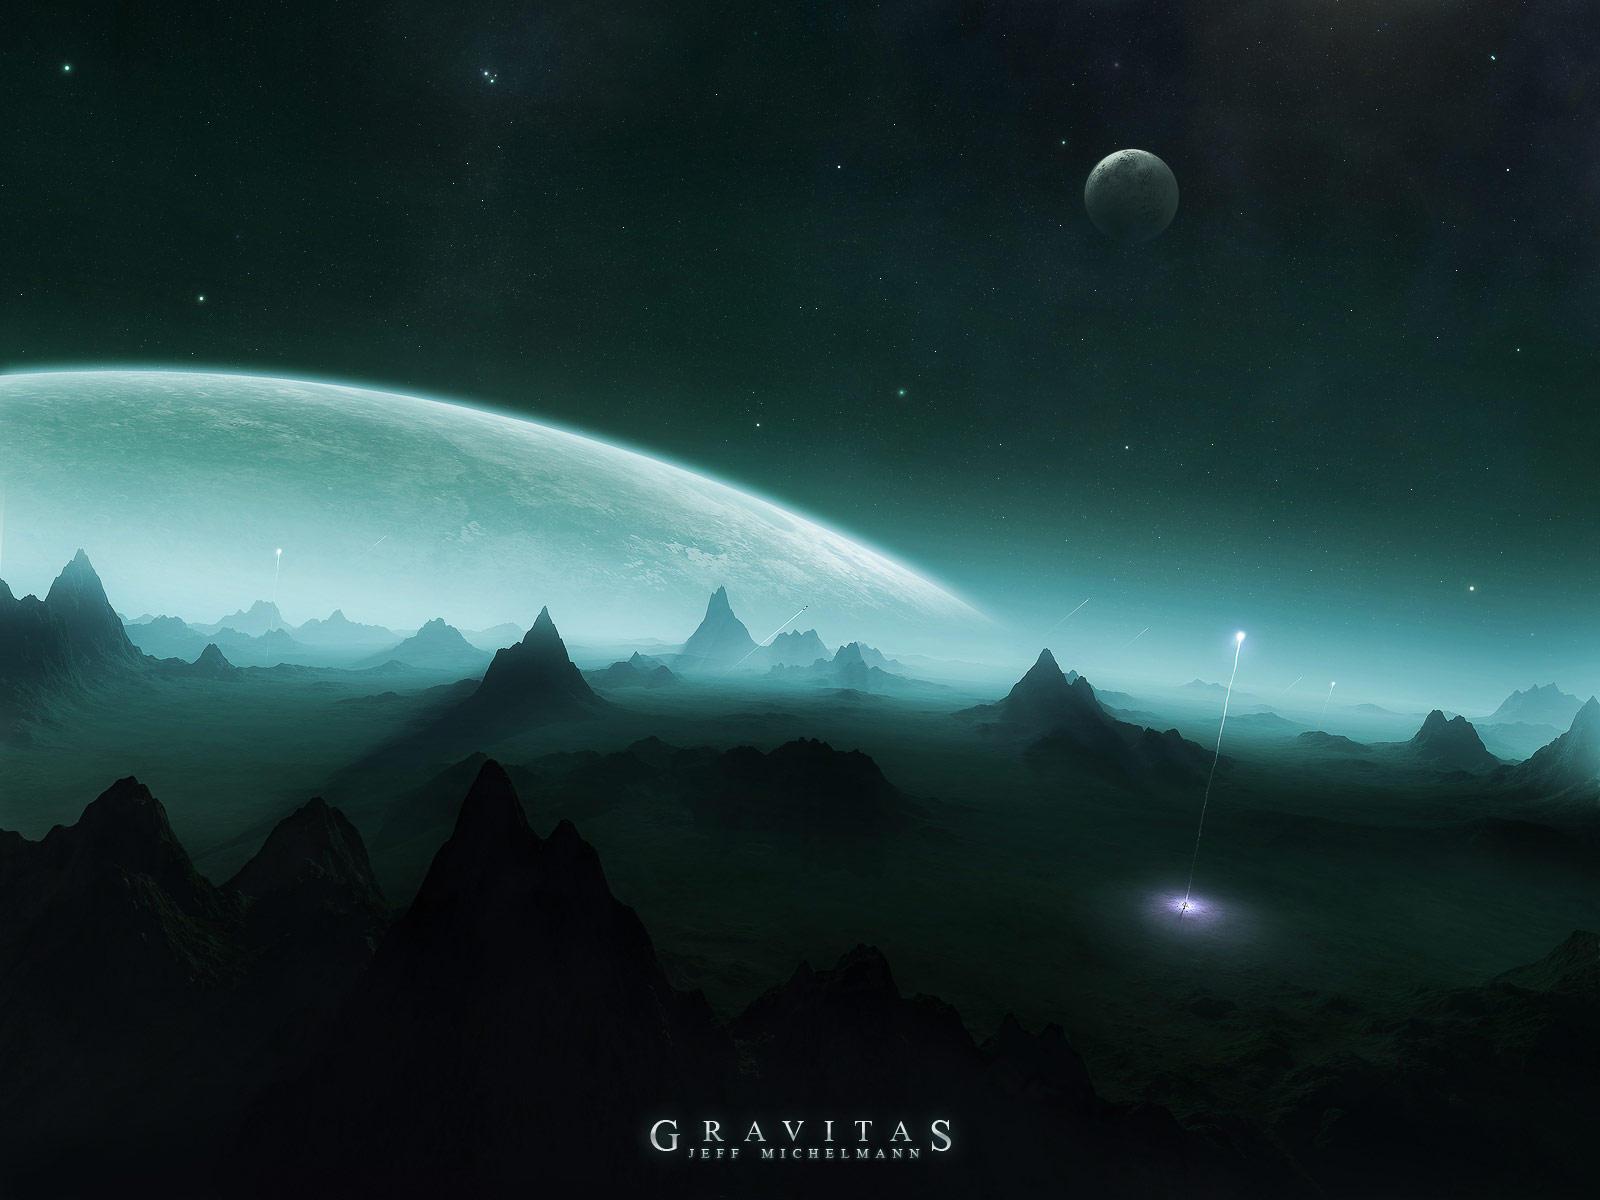 Gravitas by gucken